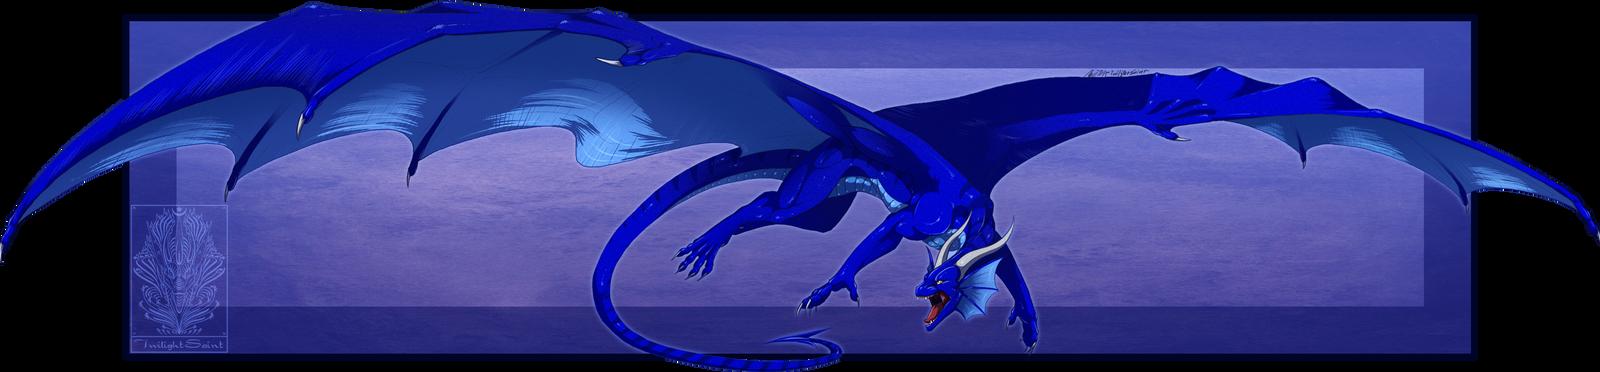 Comish - Sapphire Rage by TwilightSaint